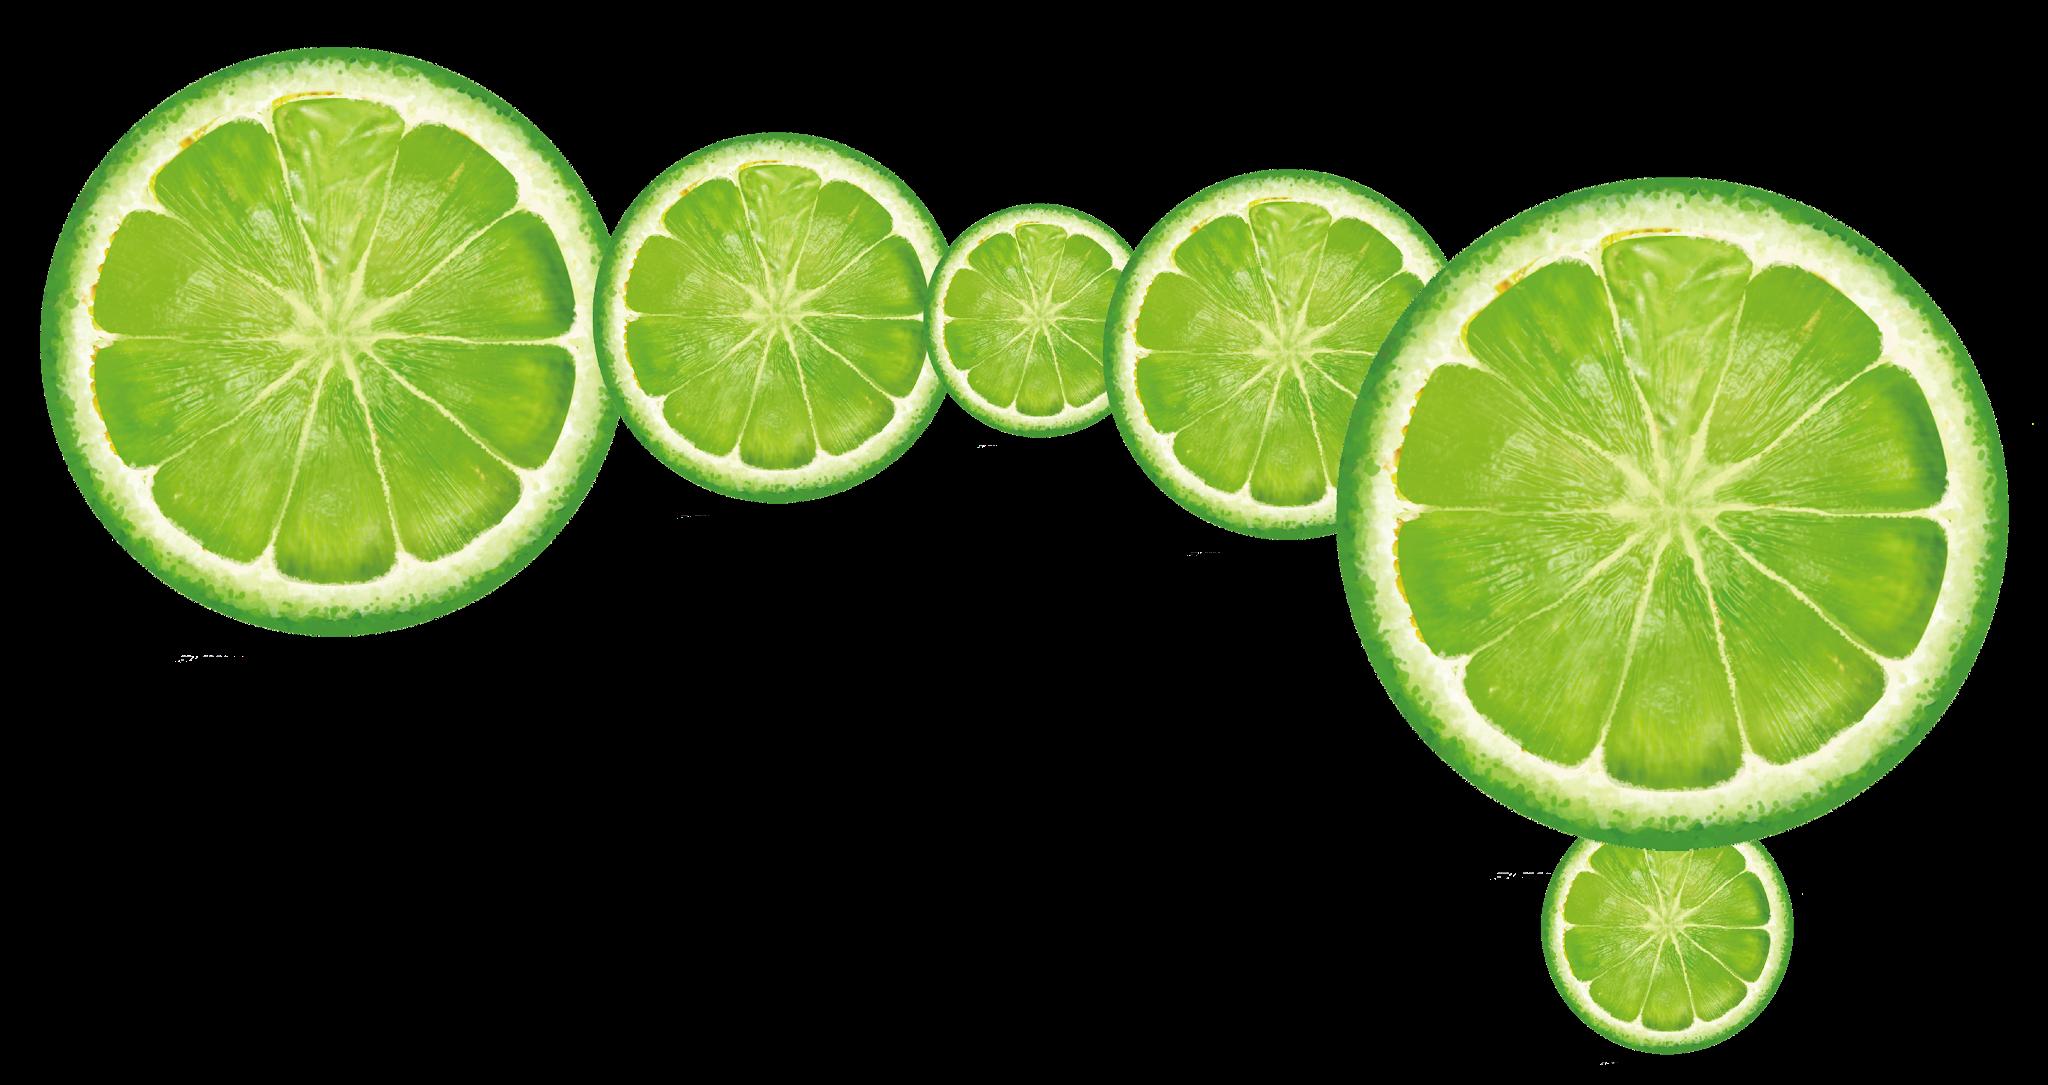 Green Lemon Png Lemon Transparent Png Image Lemon Clipart Lemon Clipart Clip Art Image